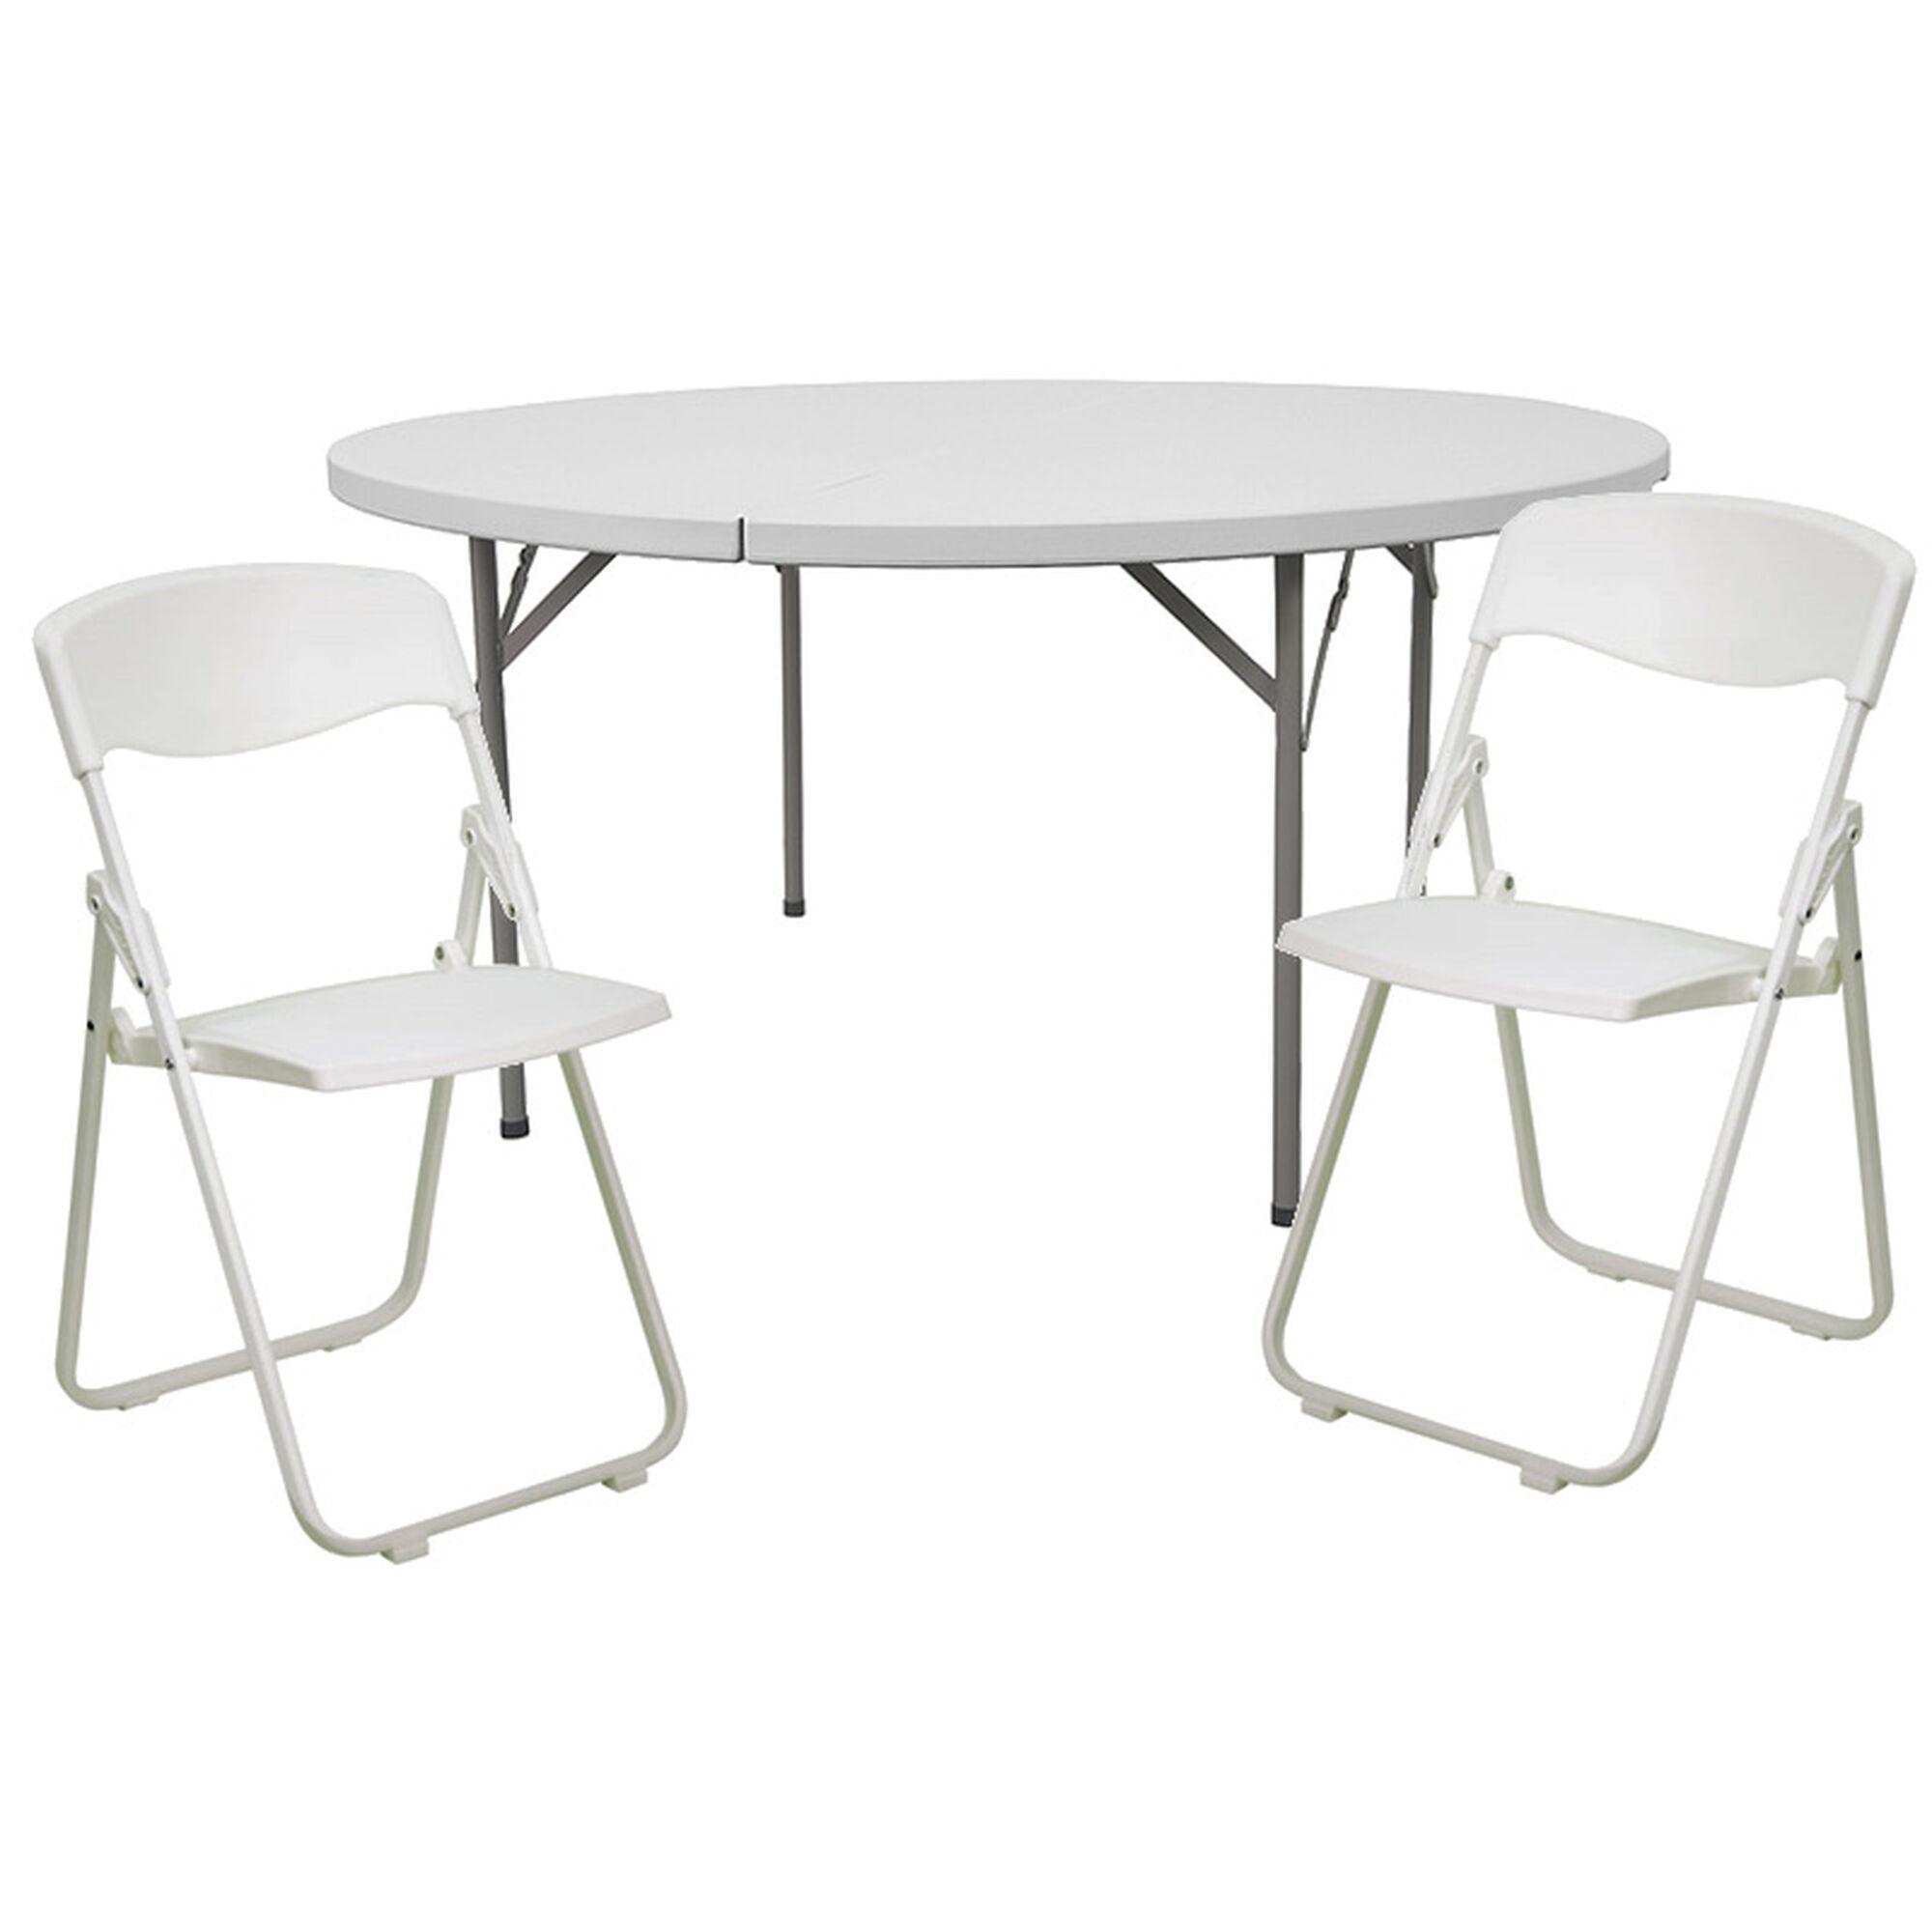 60rd White Fold Table Set Dad Ycz 154 Gw Rut I White Set Gg Churchchairs4less Com